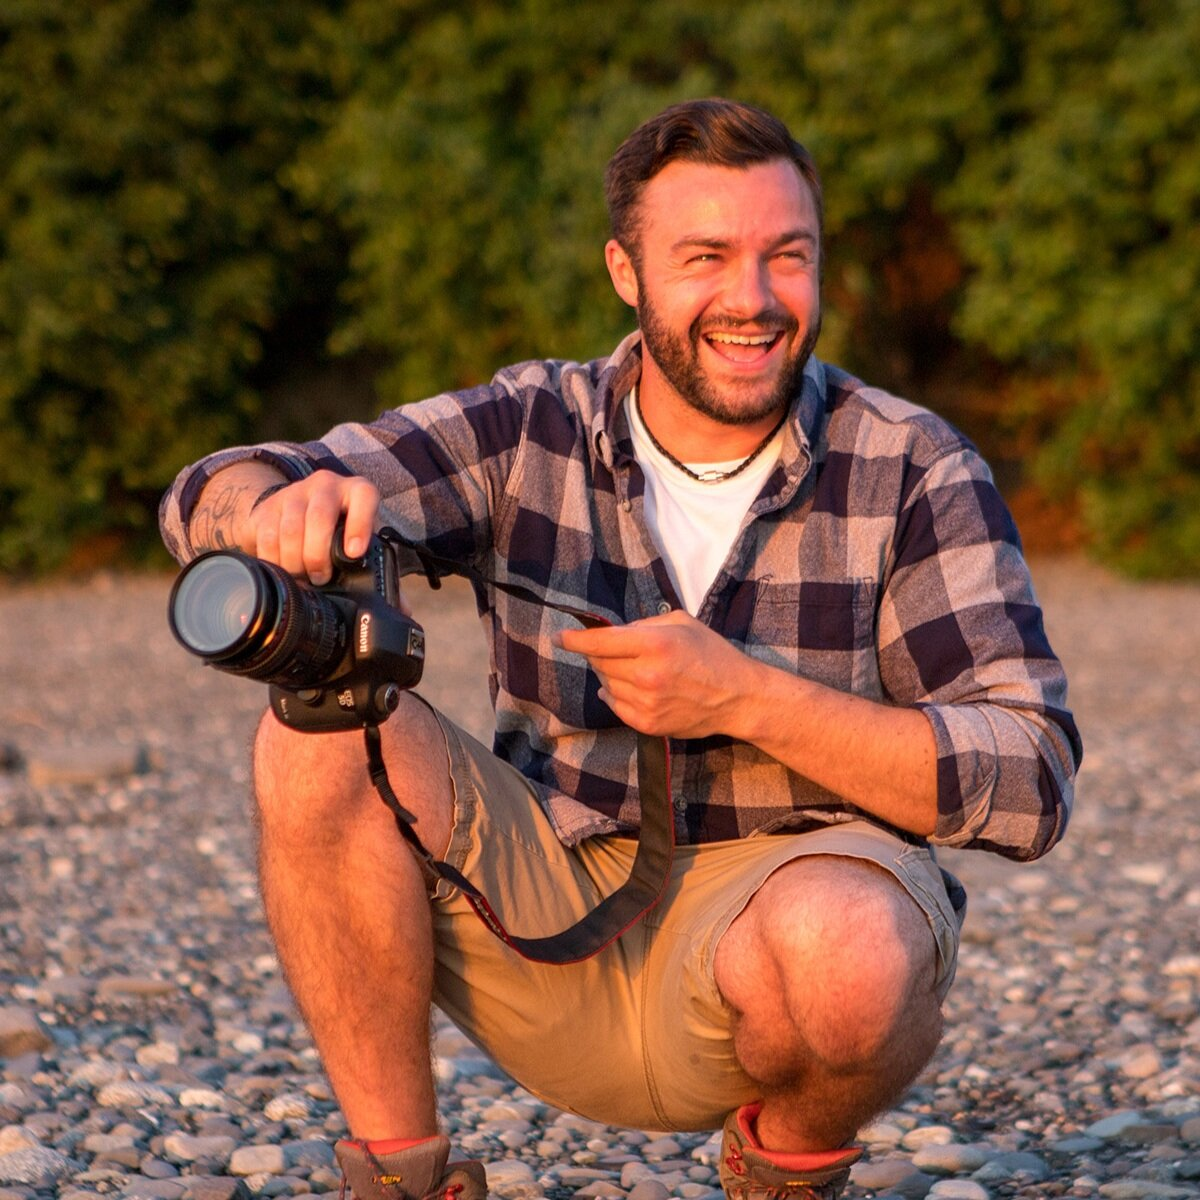 dan-redfield-alaska-photoventures-adventure-photographer-anchorage-based-11.jpg